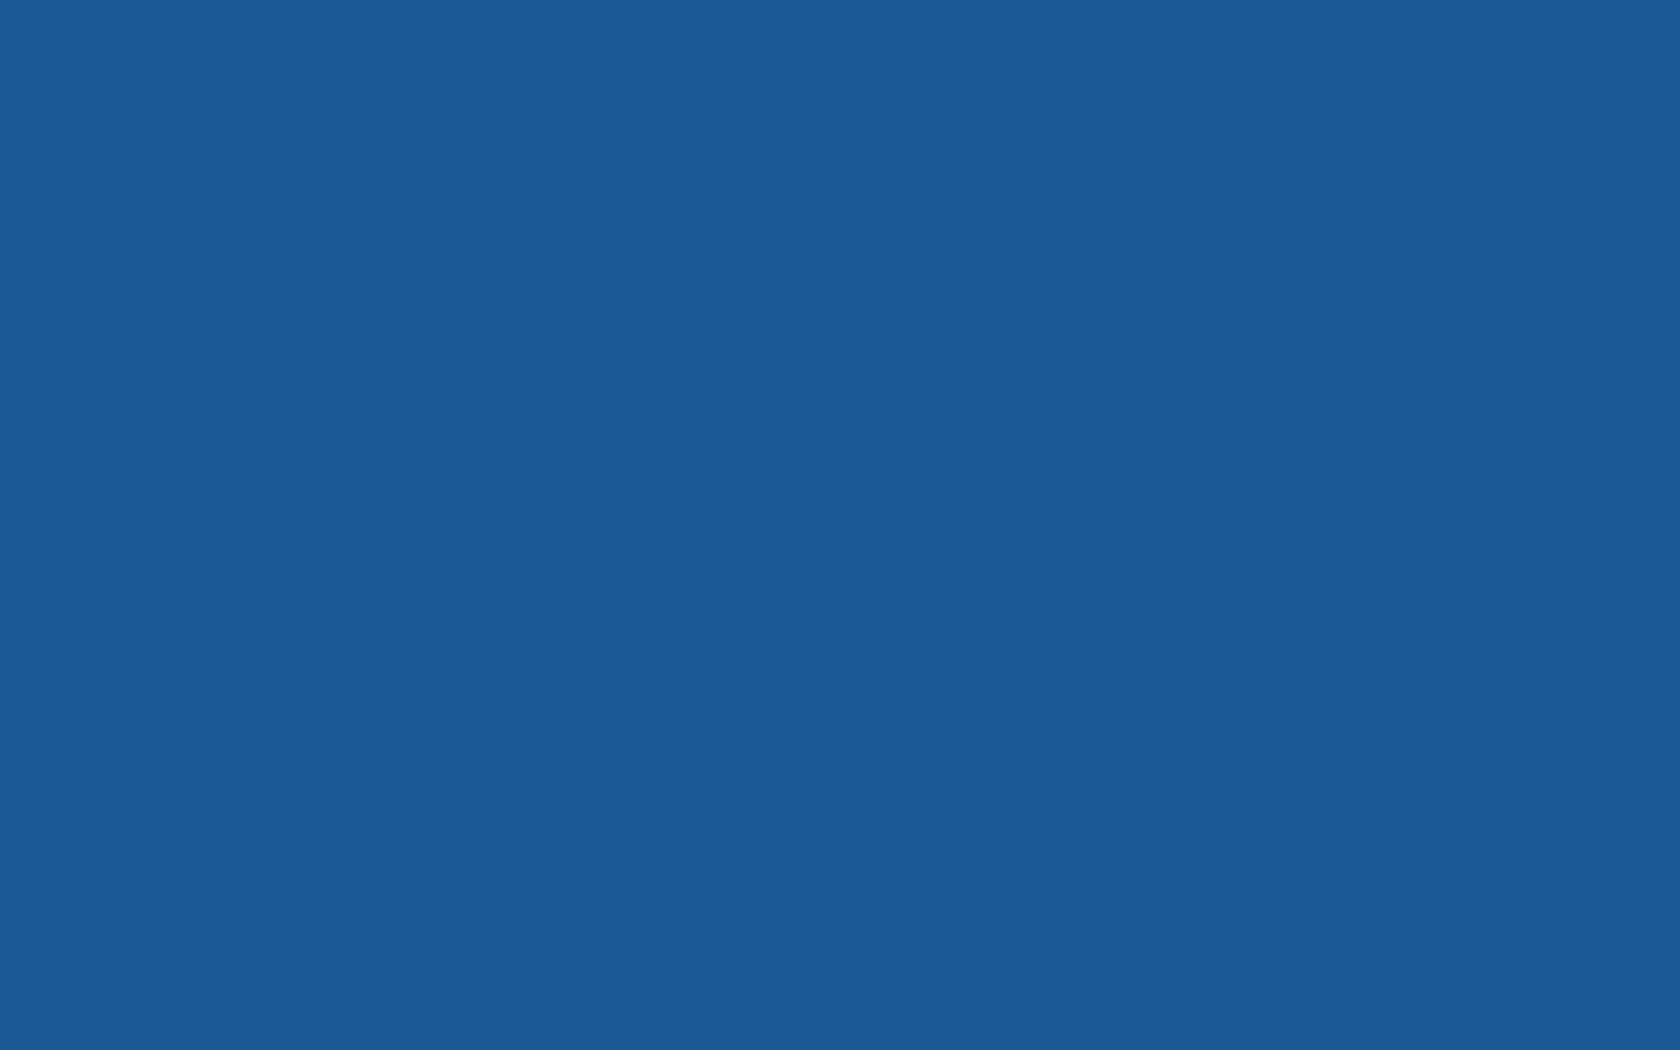 Windows 7 Classic Logon   Microsoft Windows Discussion Support 1680x1050